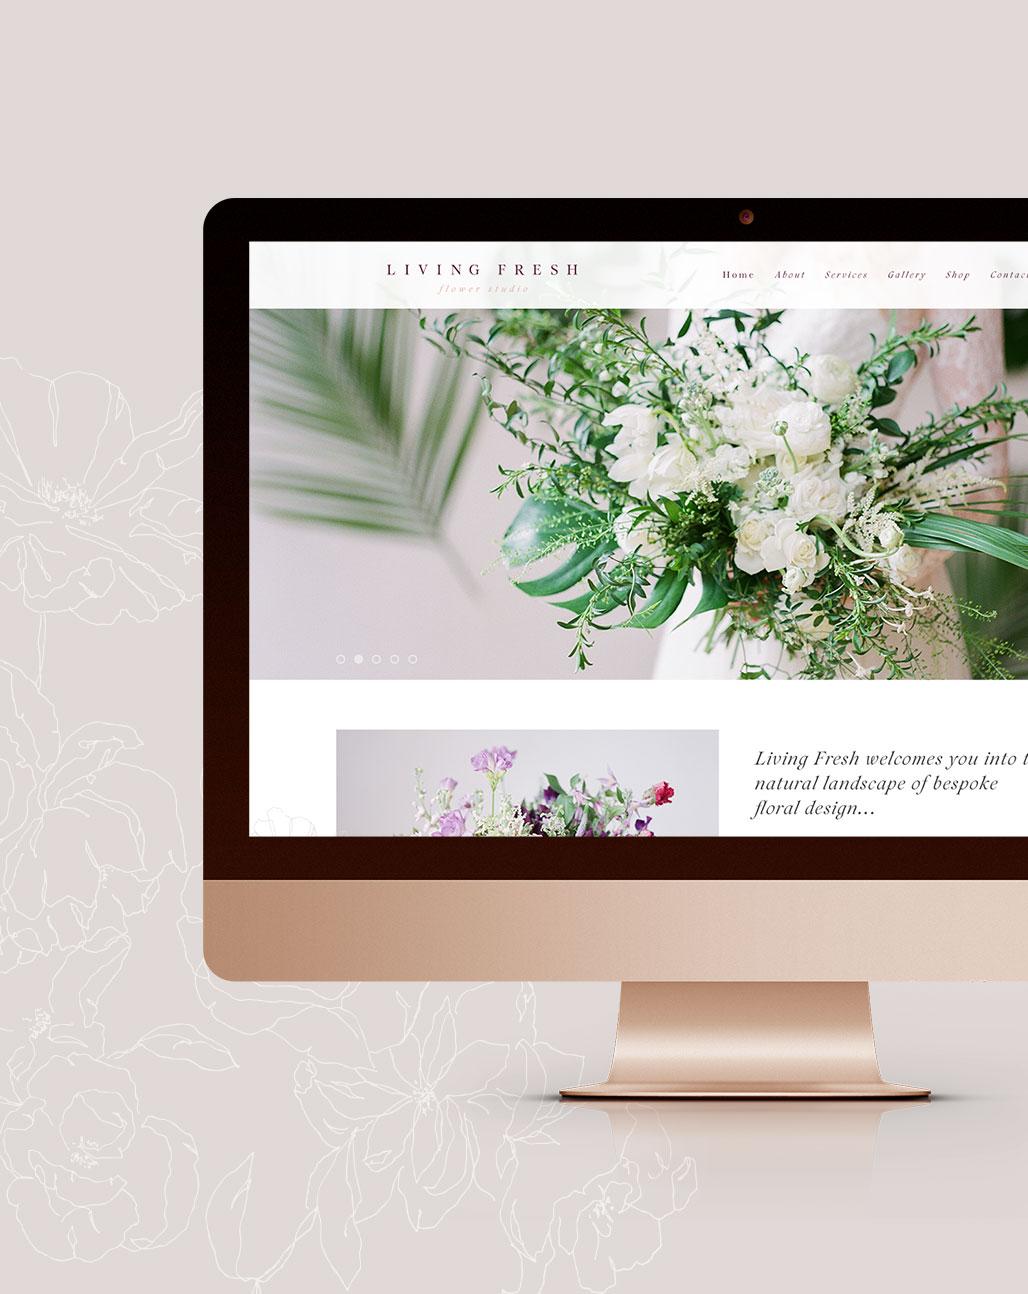 Living Fresh Brand Launch   Ashley and Malone Design